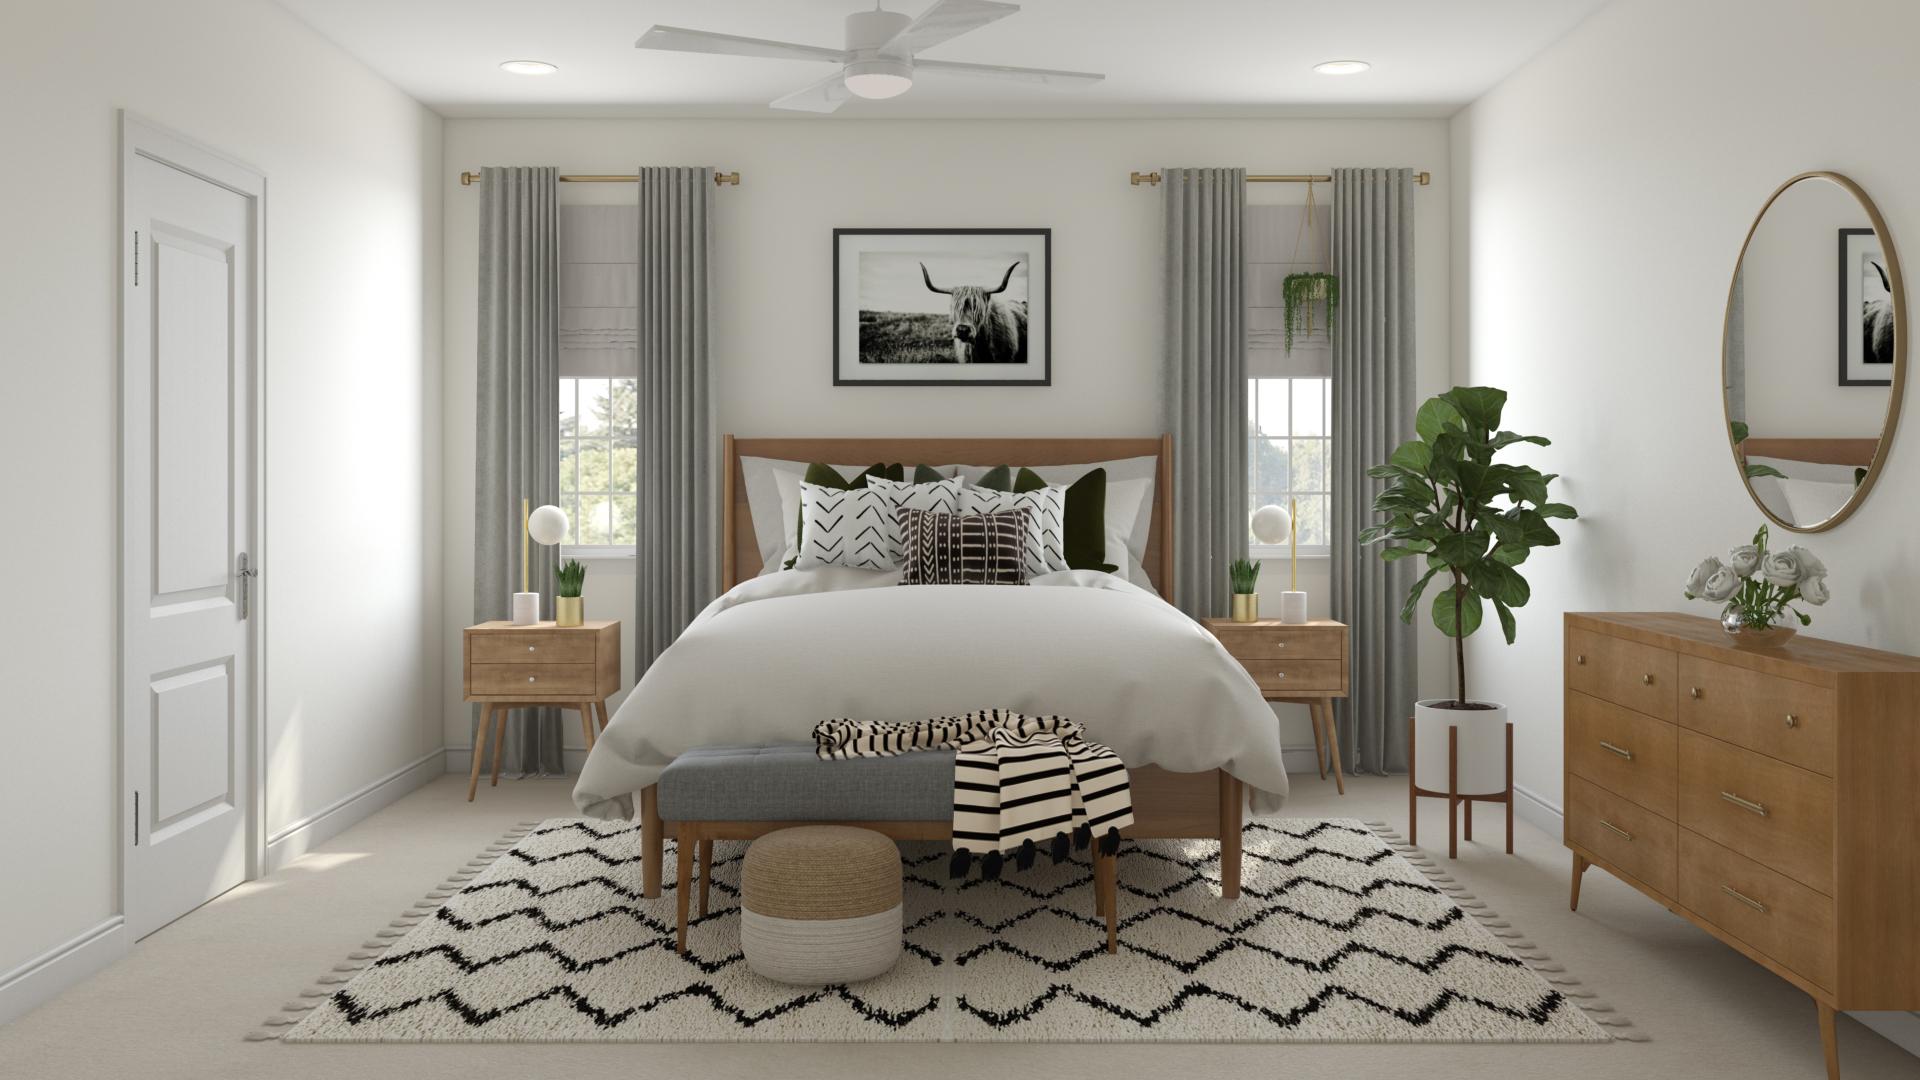 Eclectic Bohemian Glam Global Midcentury Modern Bedroom Design By Havenly Interior Designer Danielle